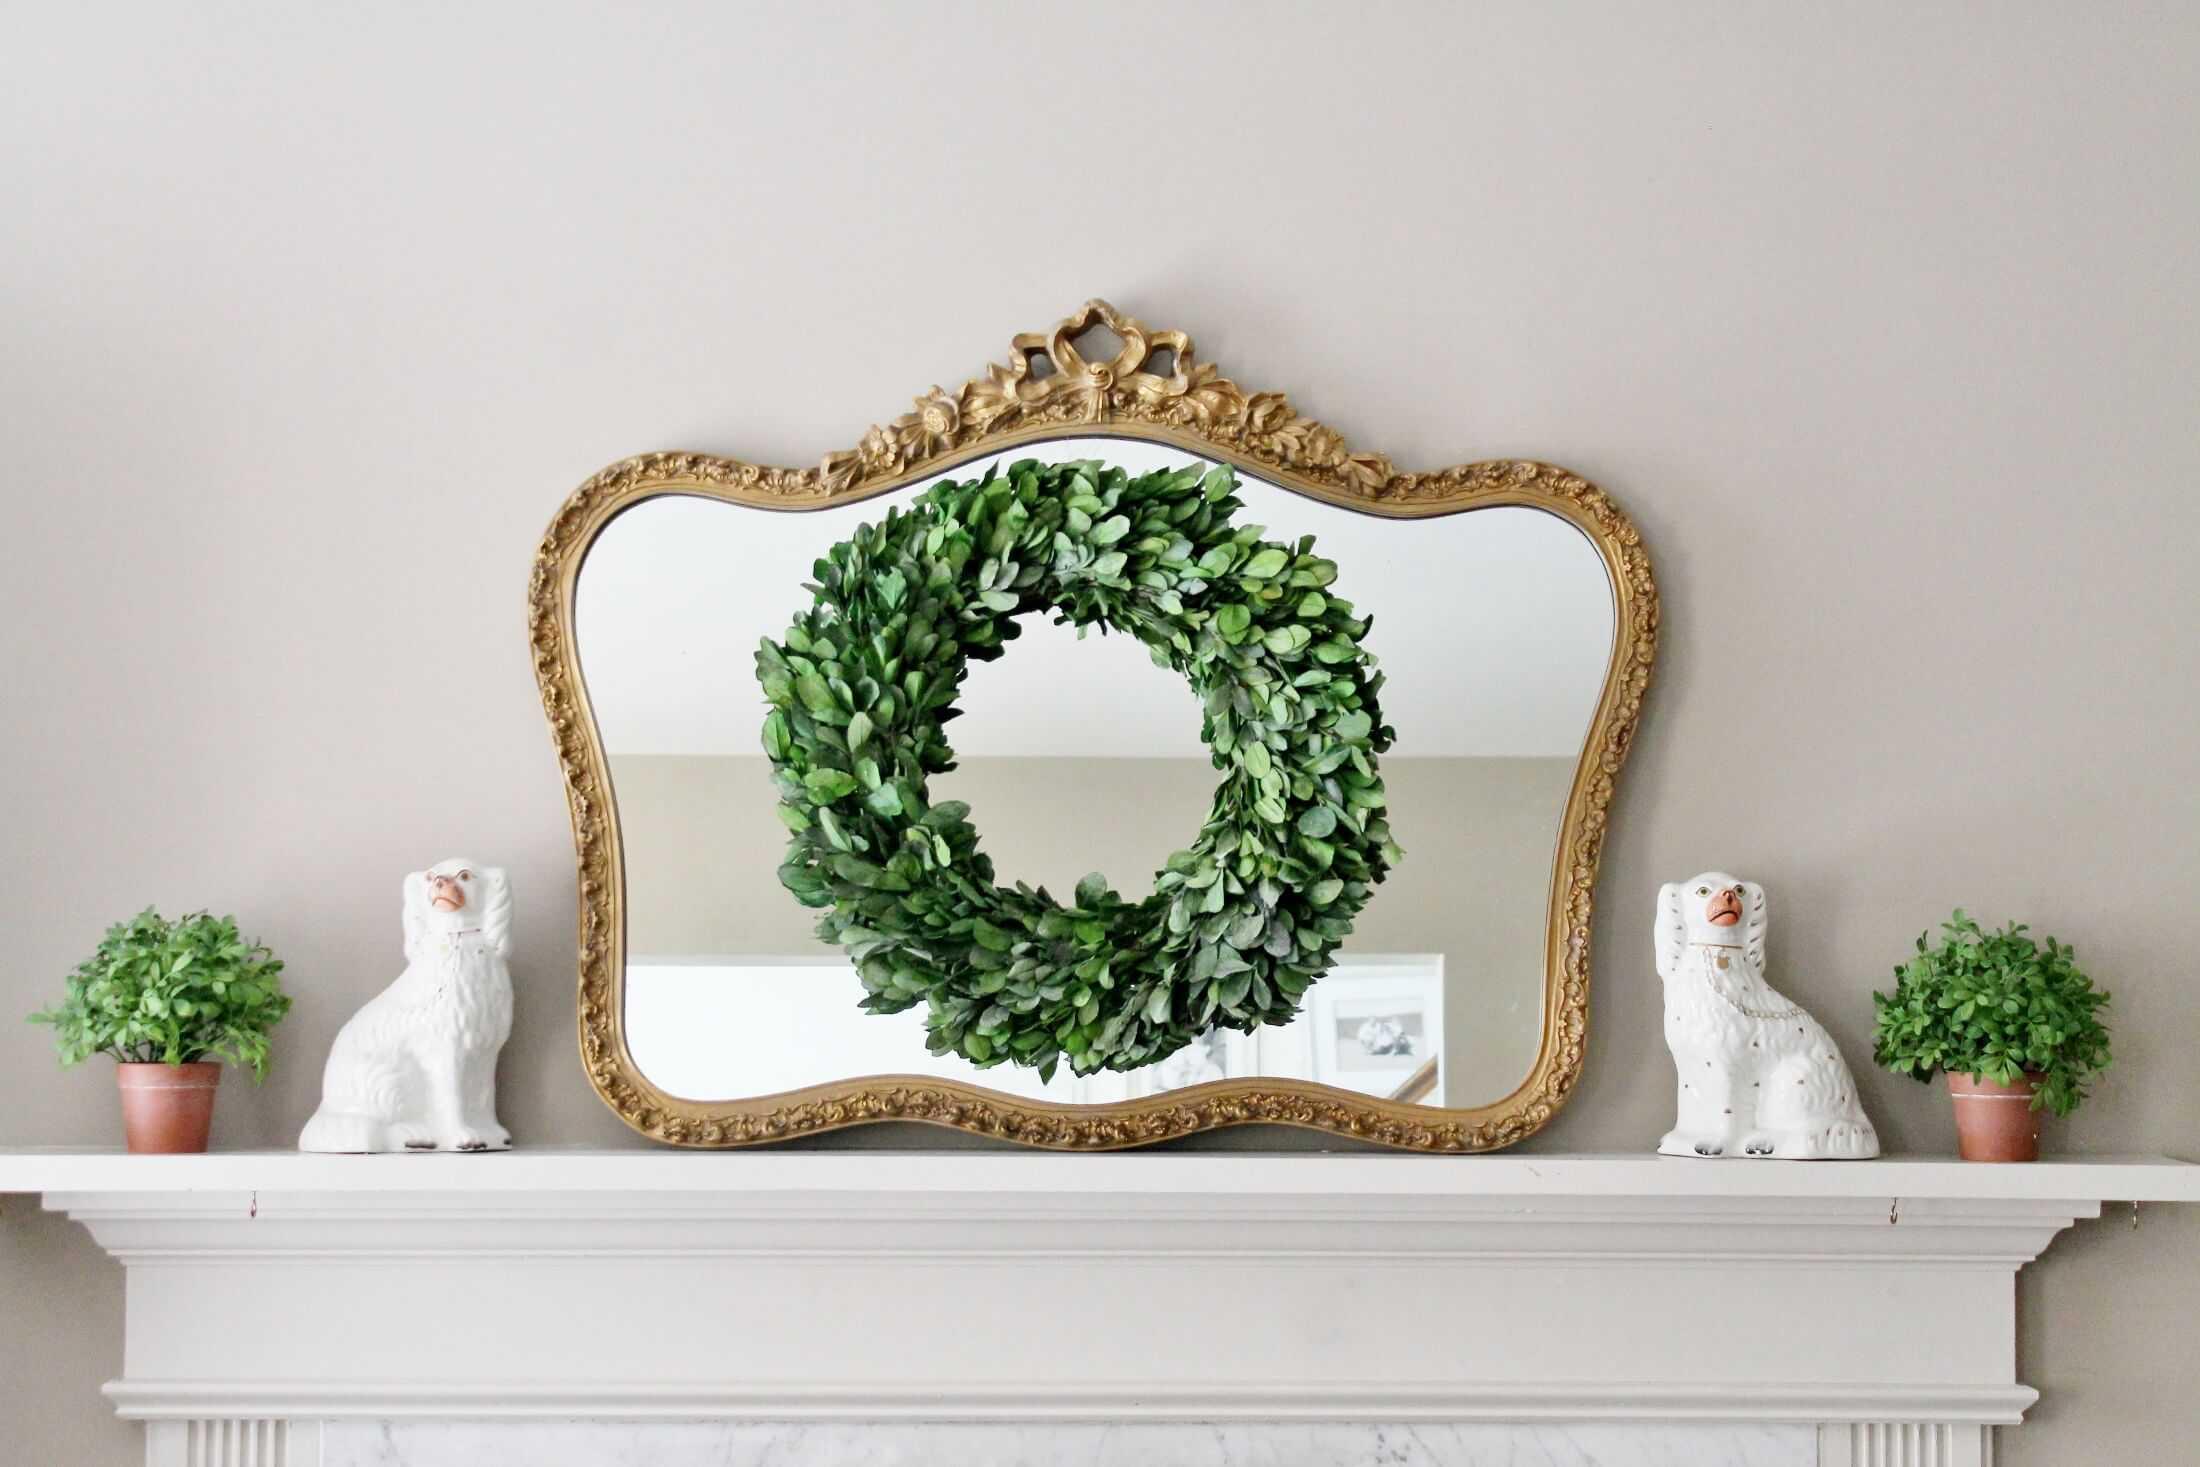 boxwood wreath hanging on vintage gold gilt mirror